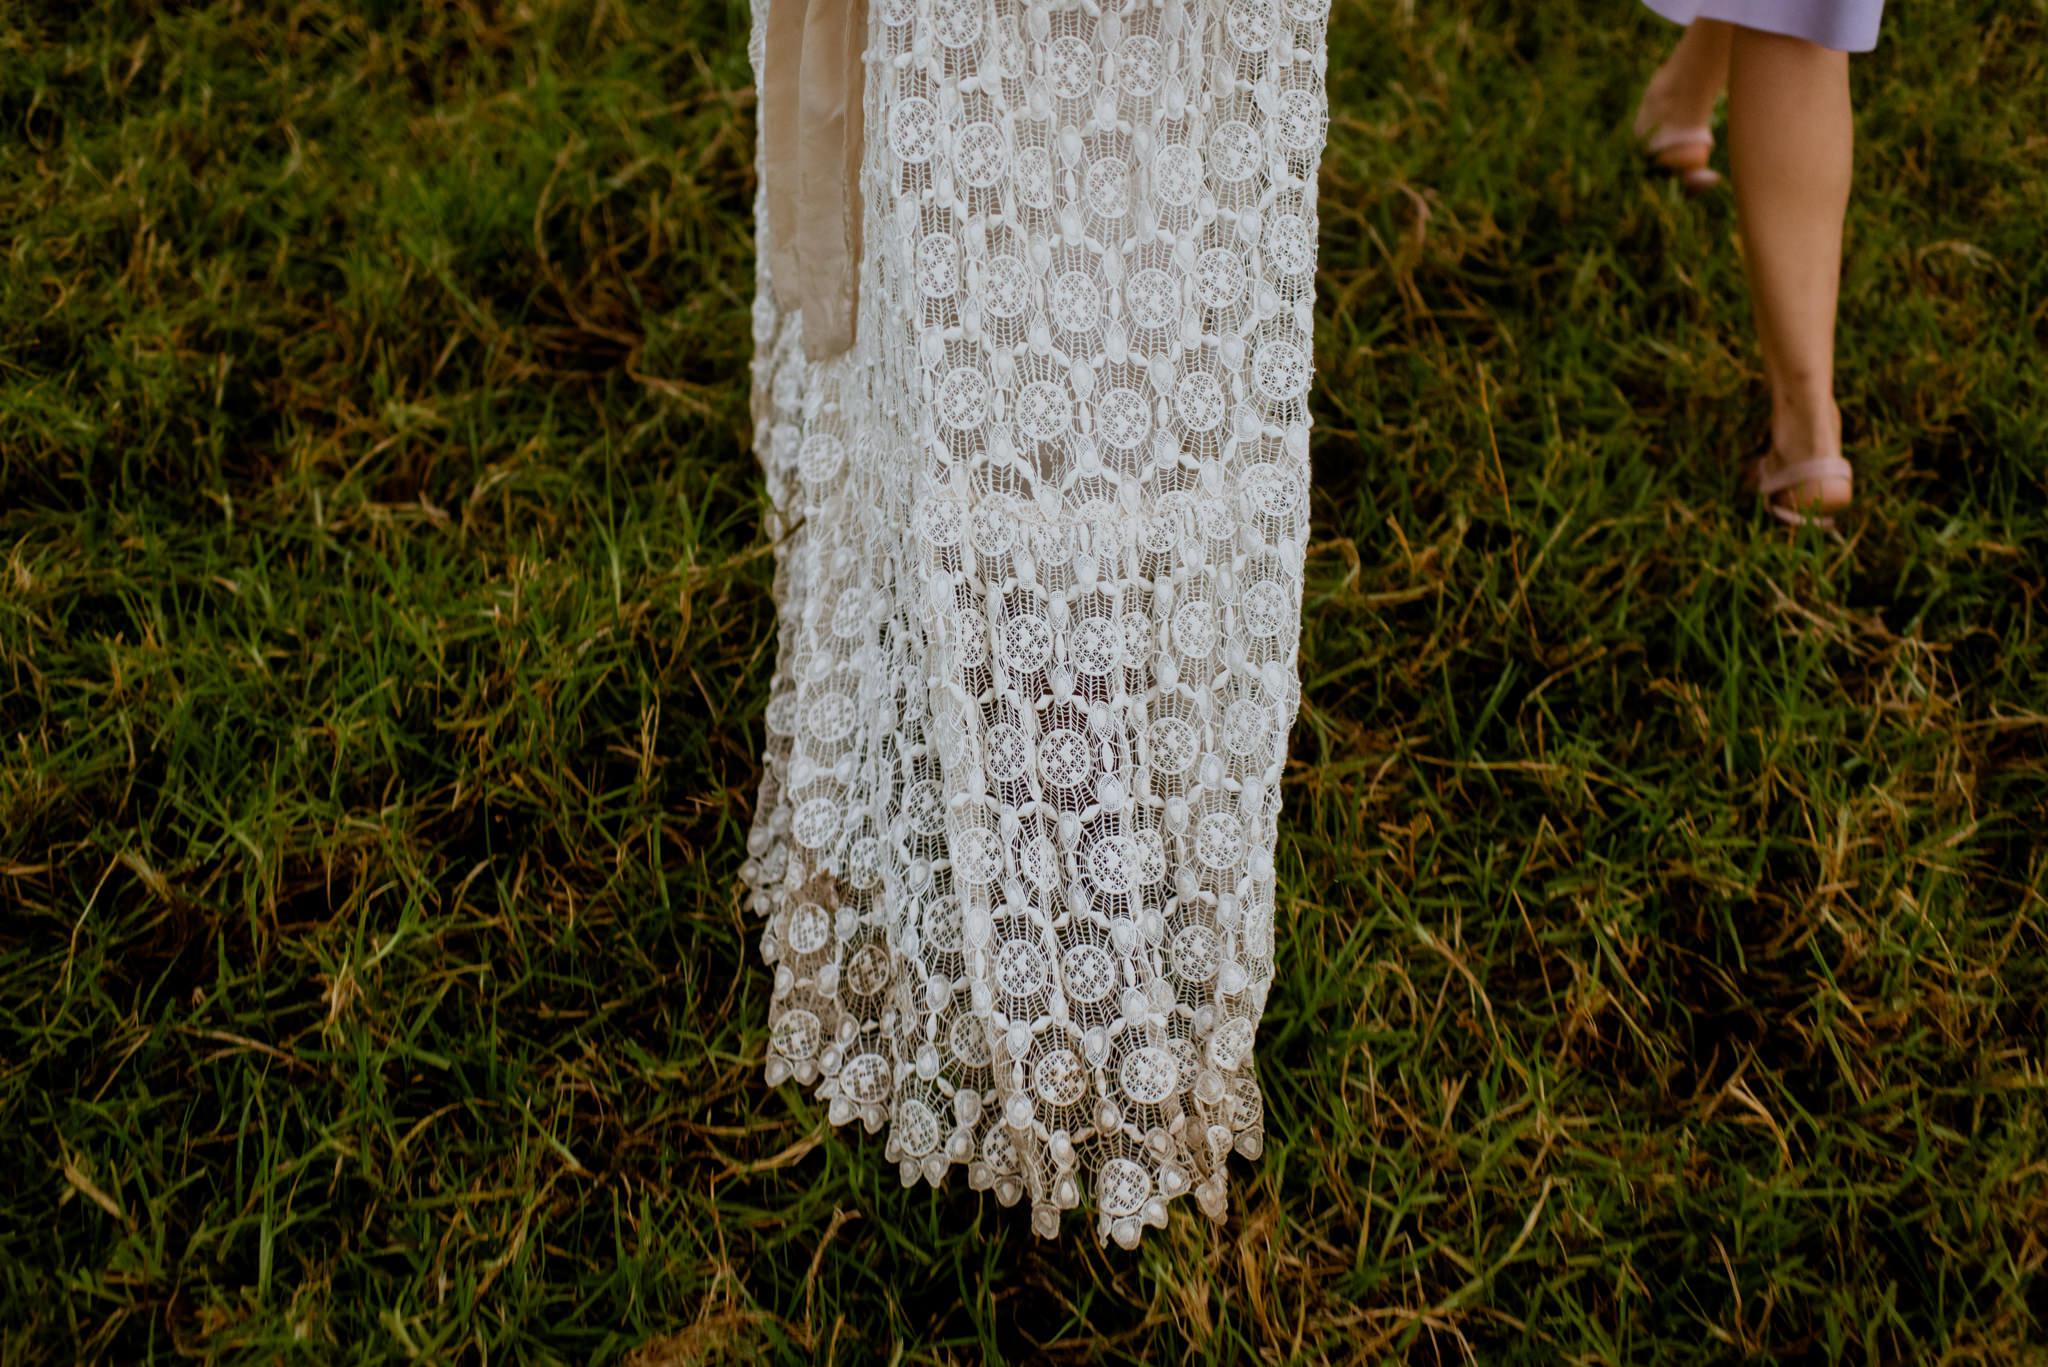 Close up of muddy wedding dress train on grass